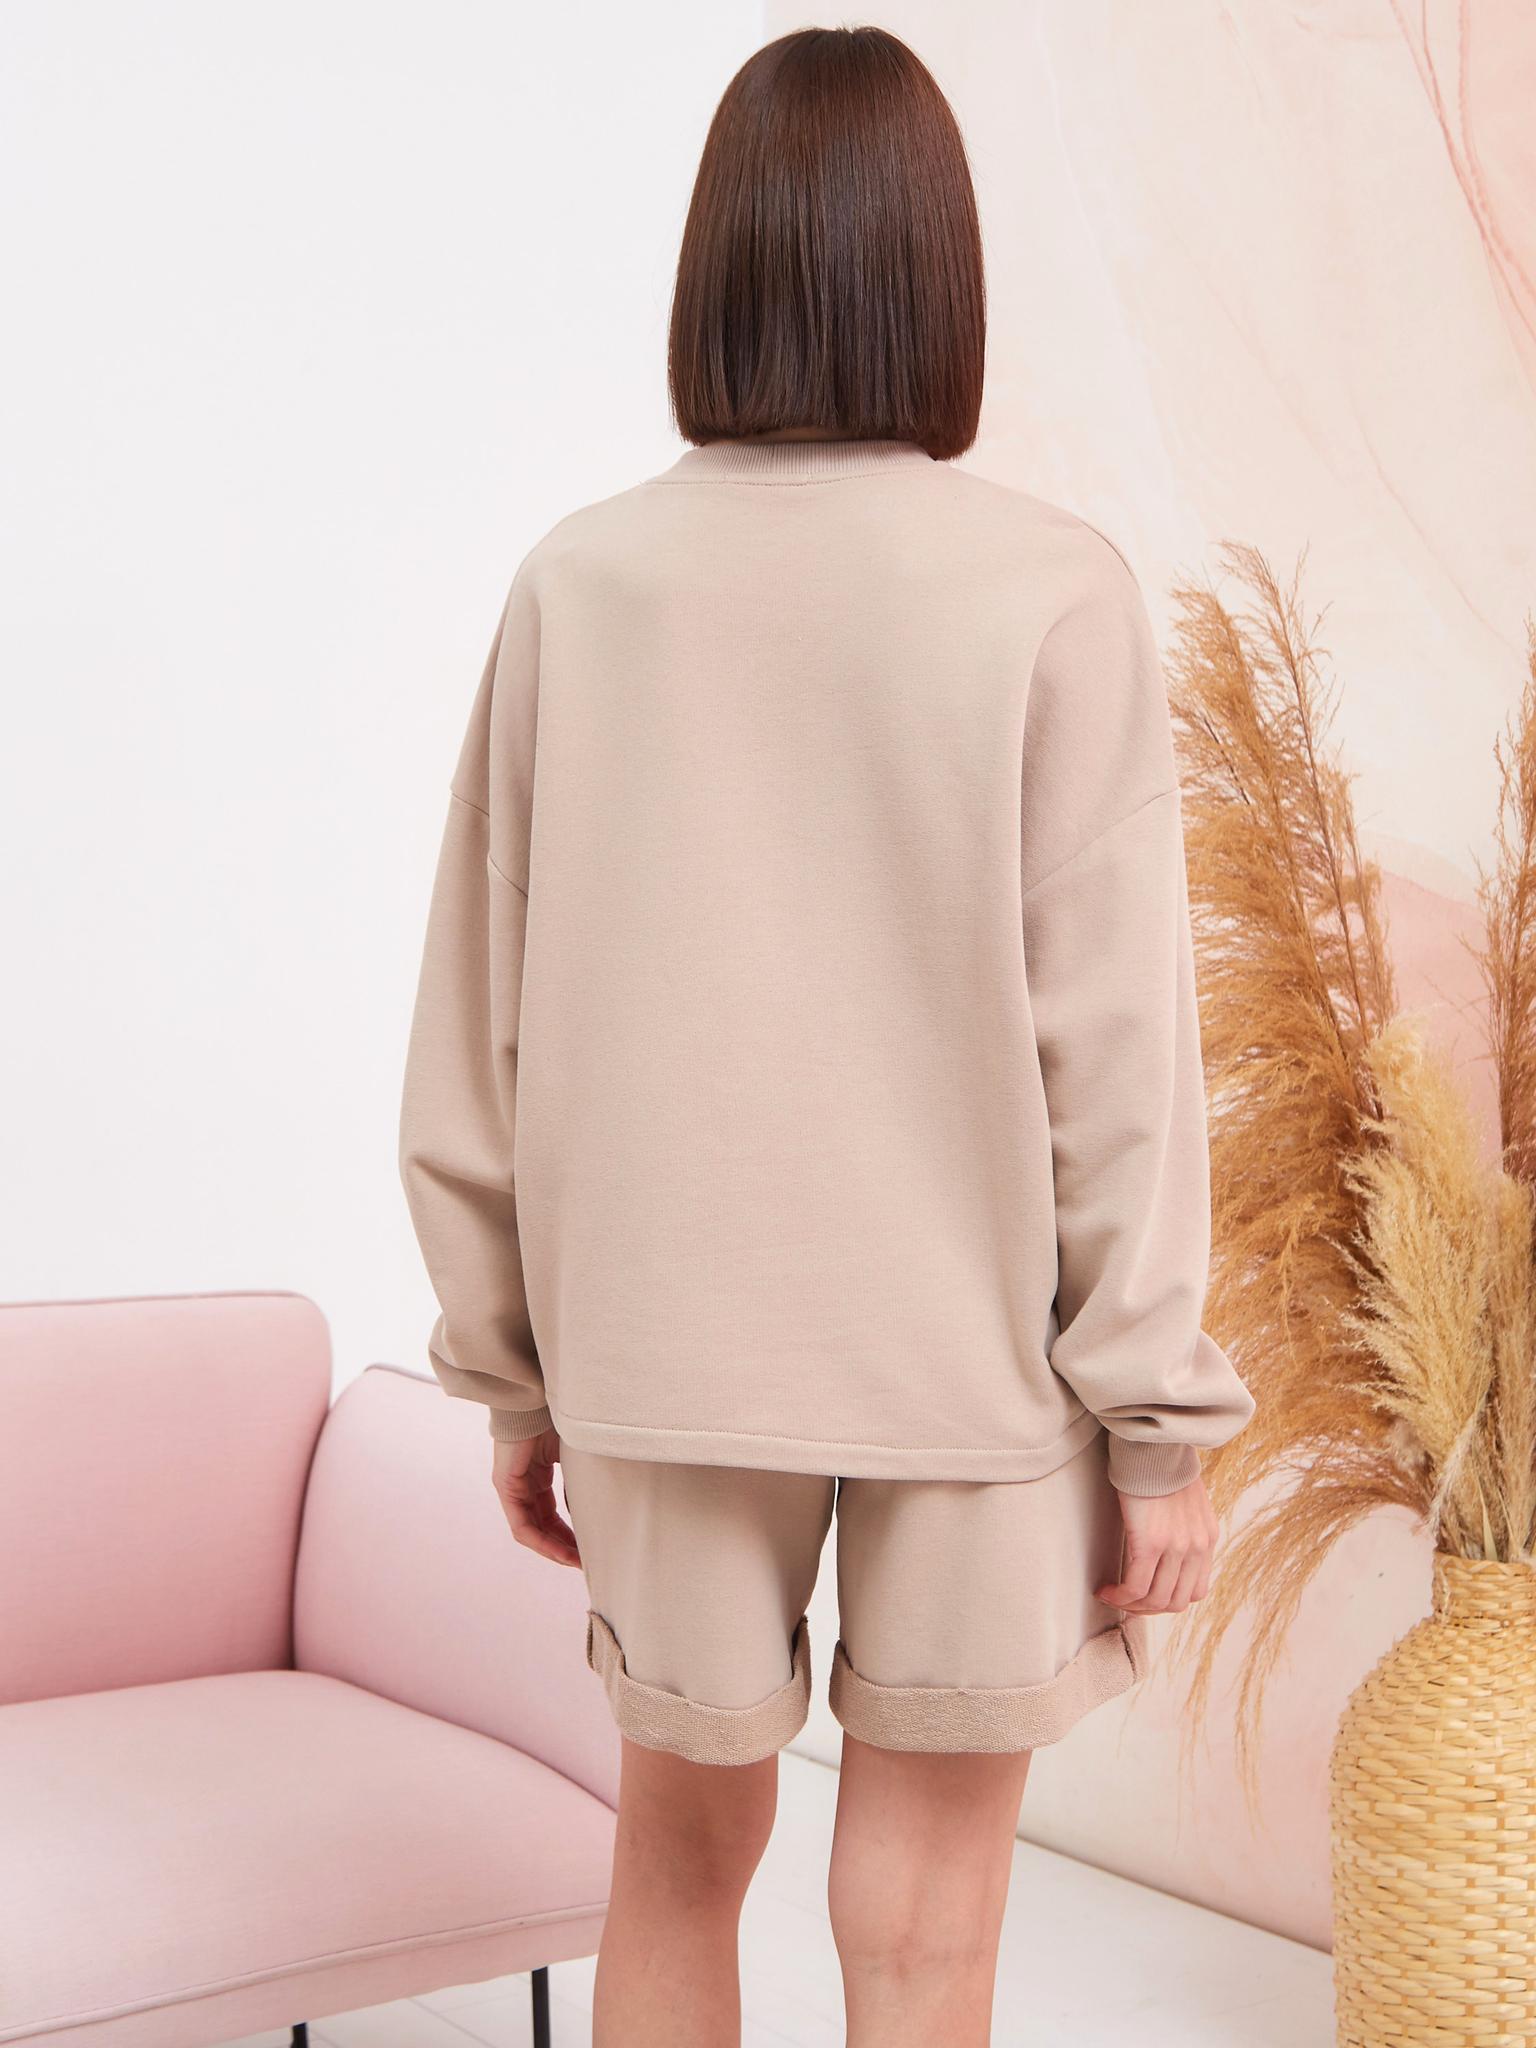 BM Костюм тройка Какао (свитшот, брюки, шорты)